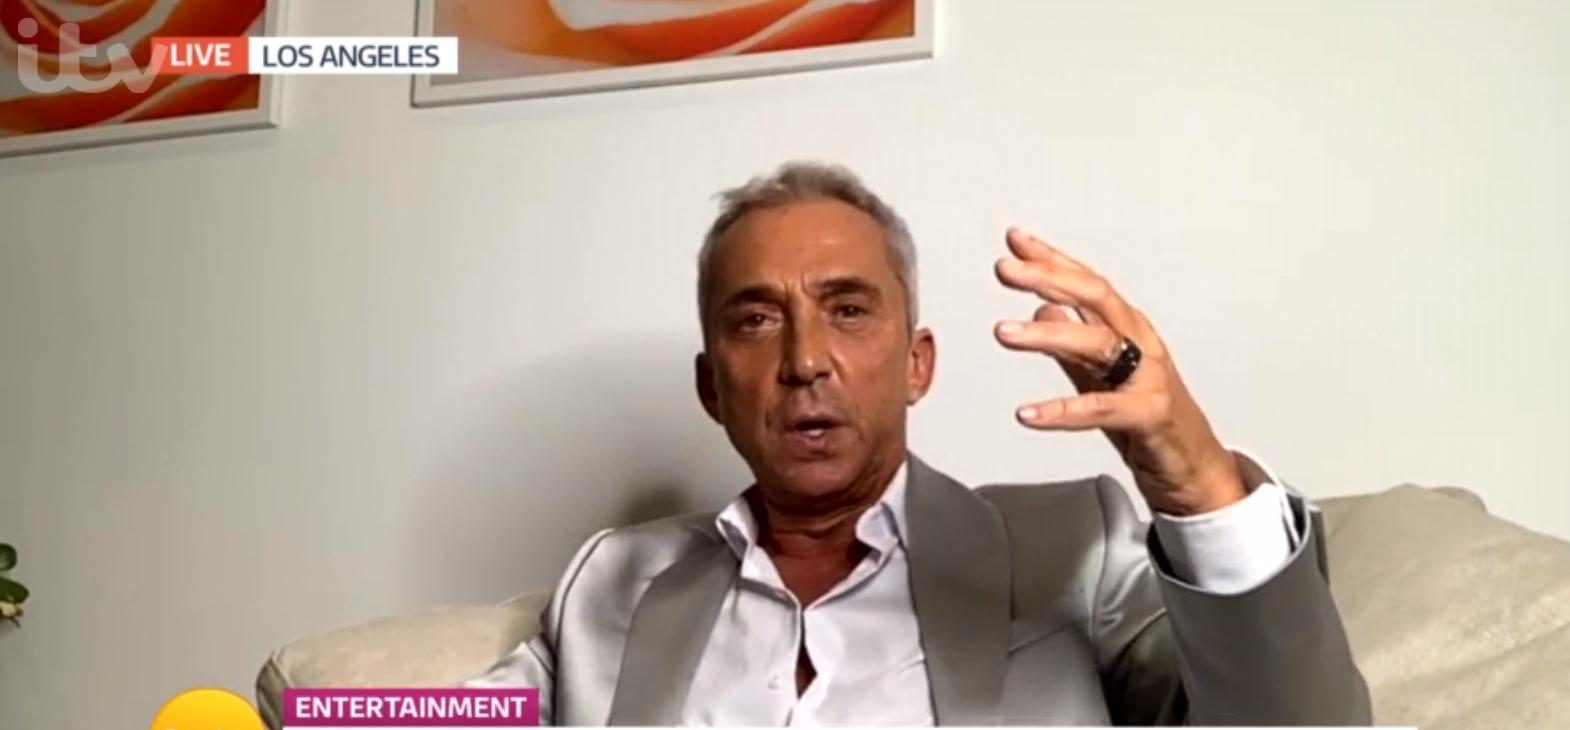 Bruno Tonioli new hair on GMB